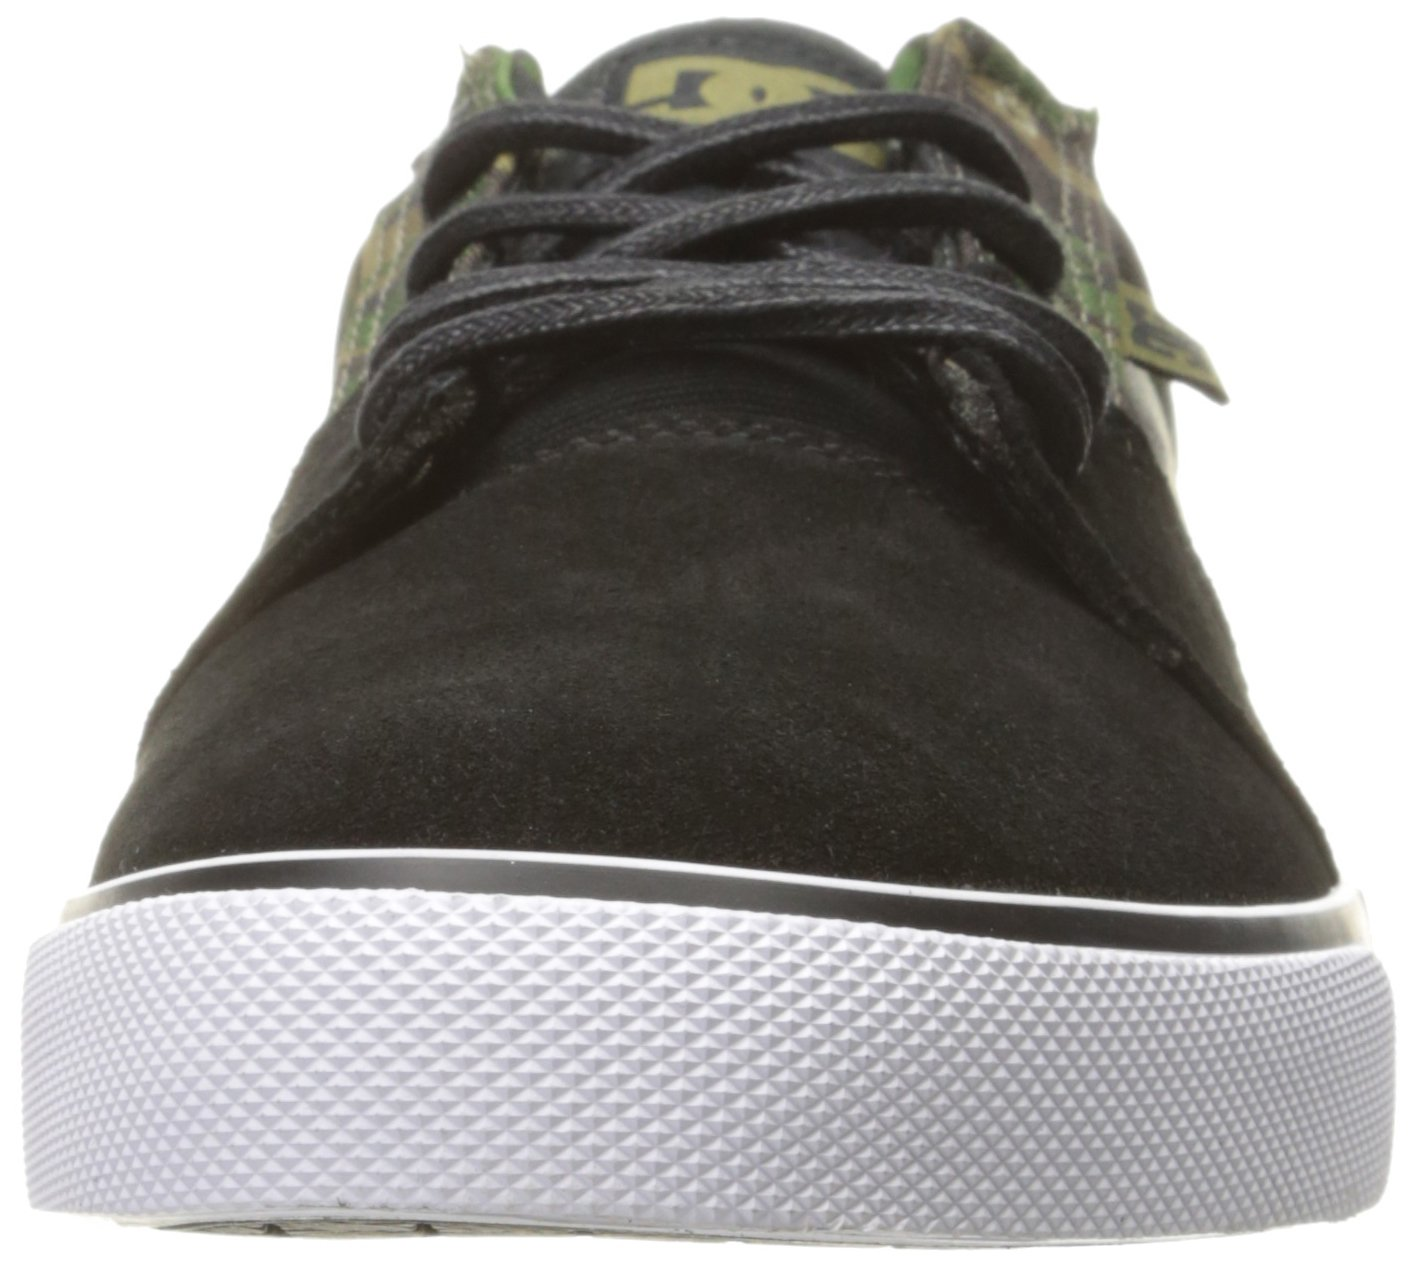 DC DC DC TONIK Unisex-Erwachsene Sneakers Camo 72a46e